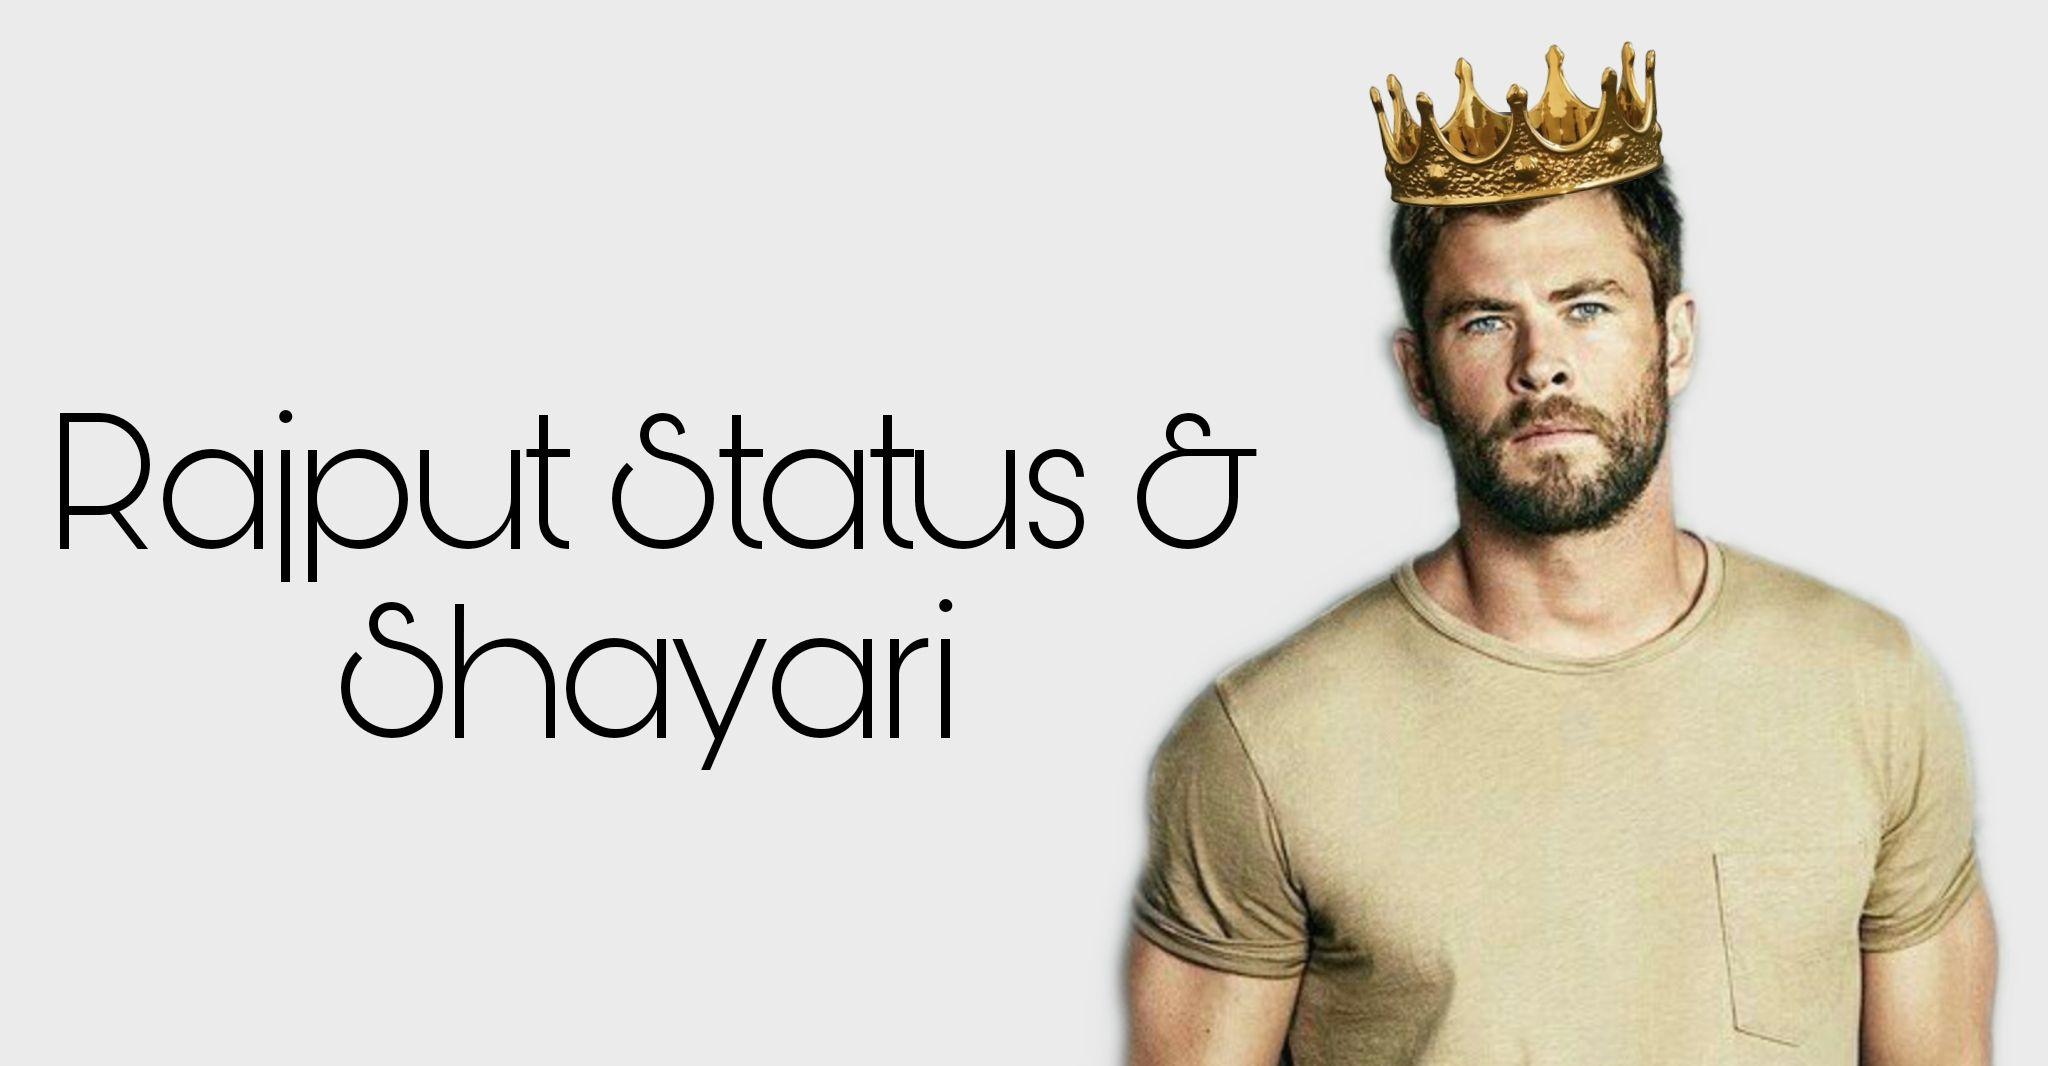 This image about Rajput Status And Shayari